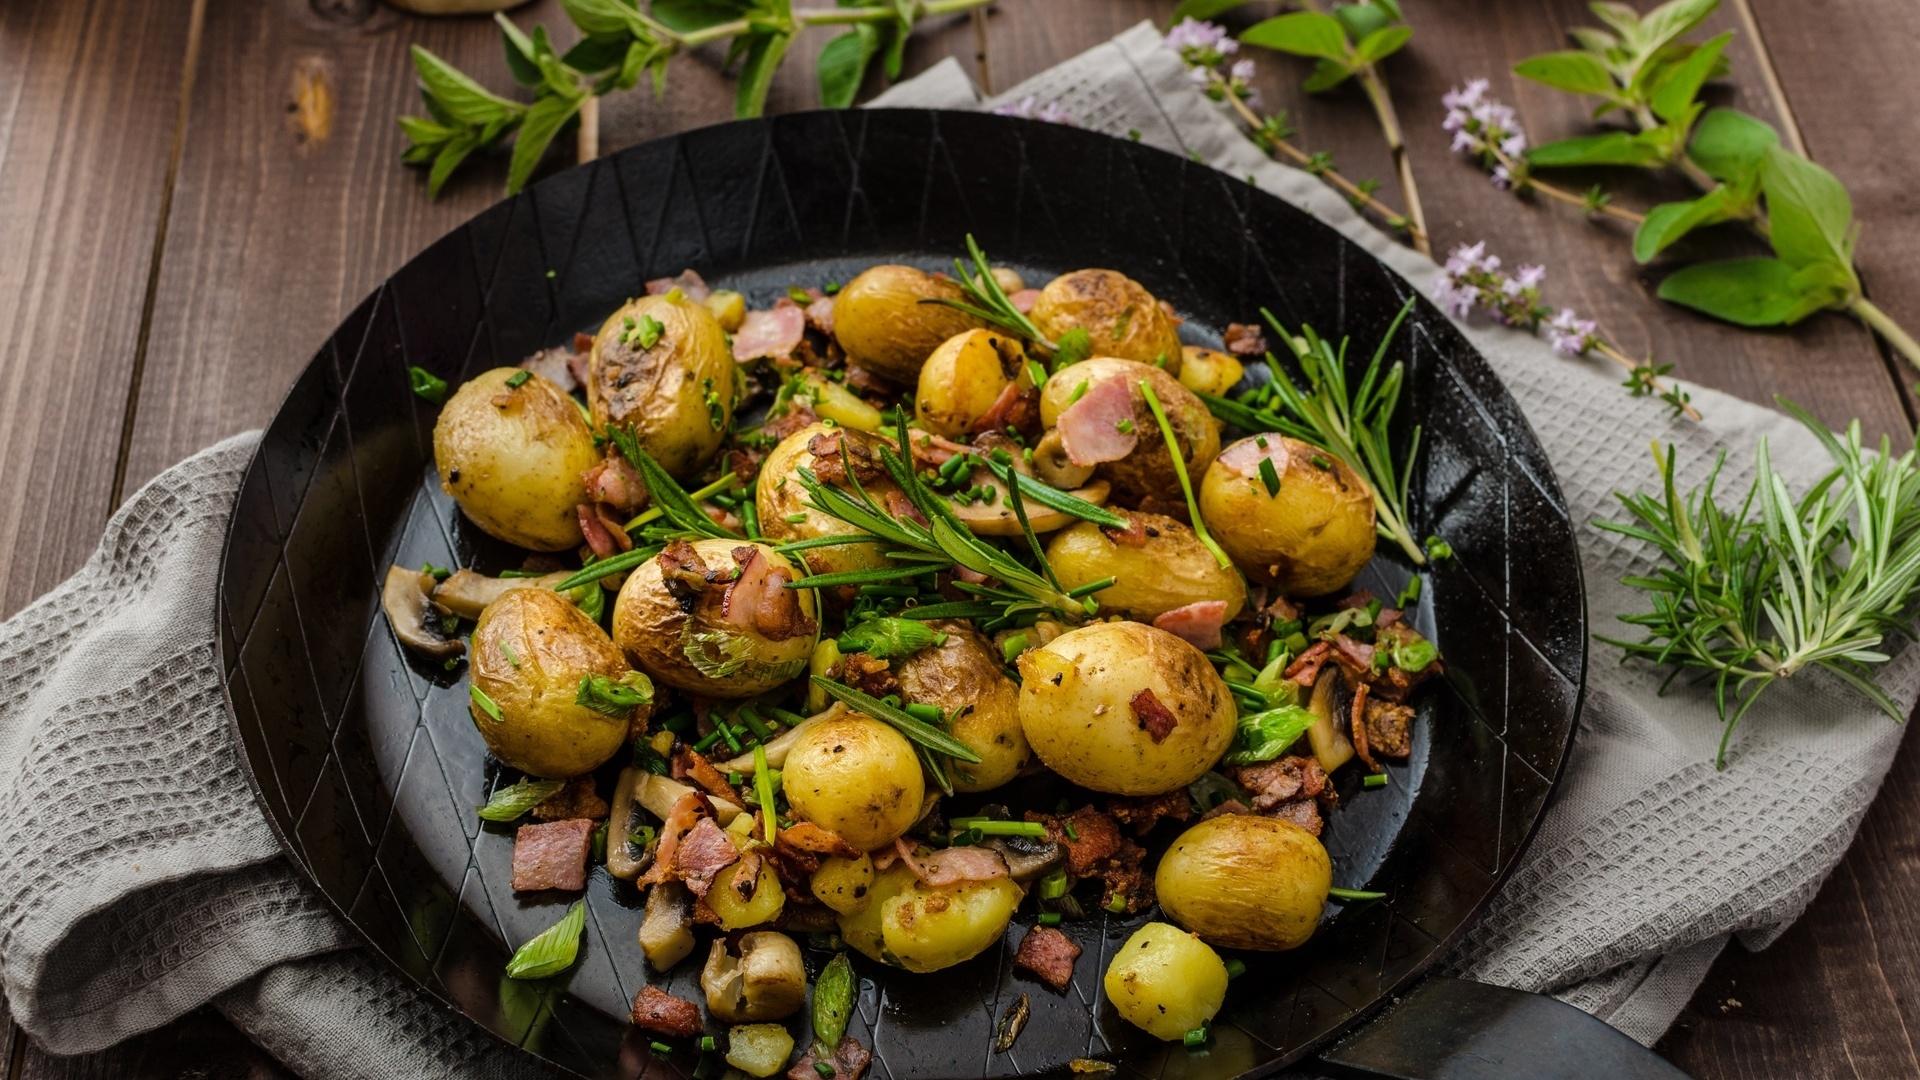 Potatoes hd wallpaper download